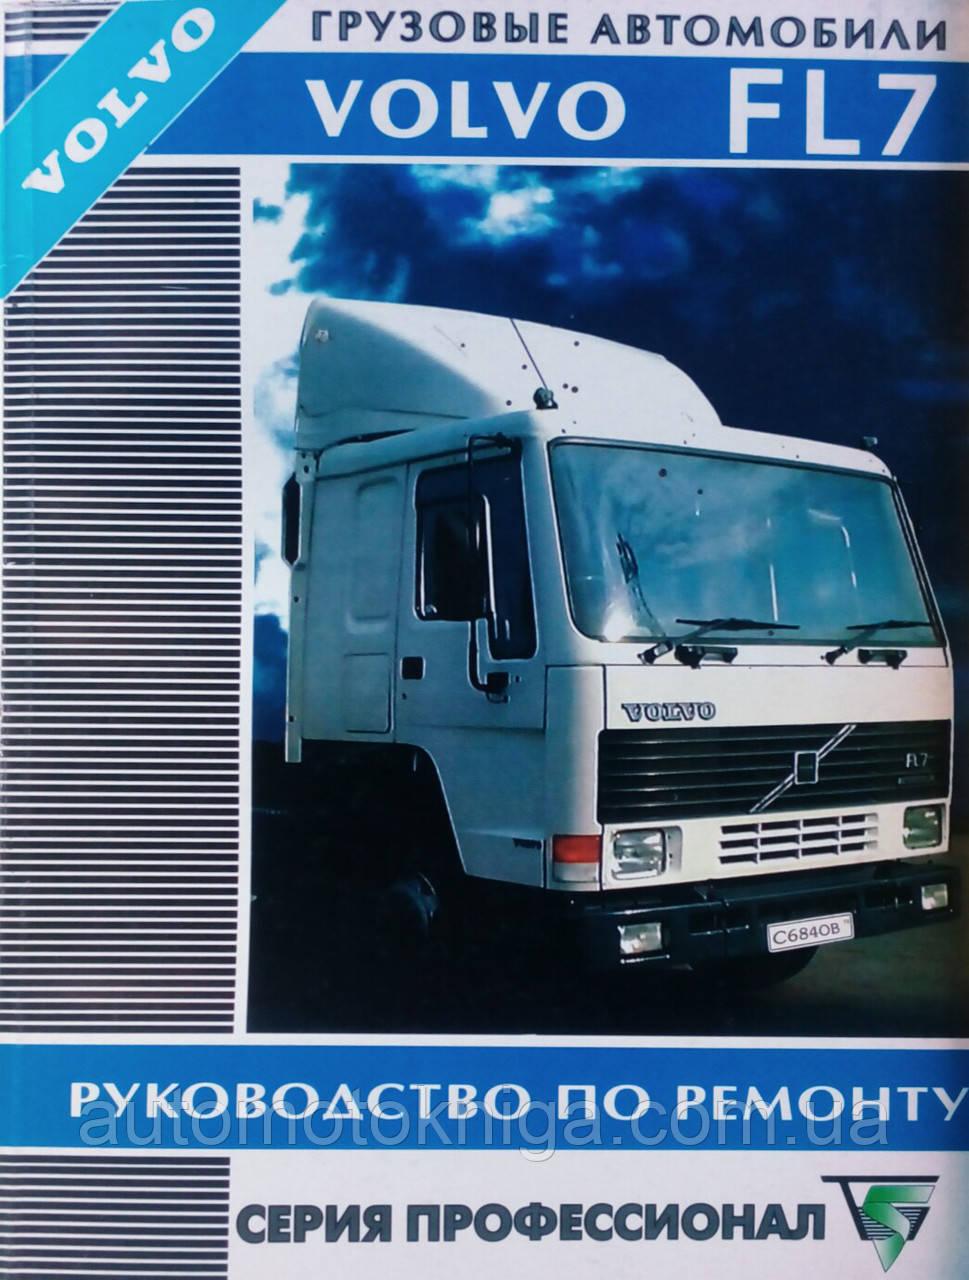 VOLVO FL7  Модели 1985-1993 гг. Руководство по ремонту